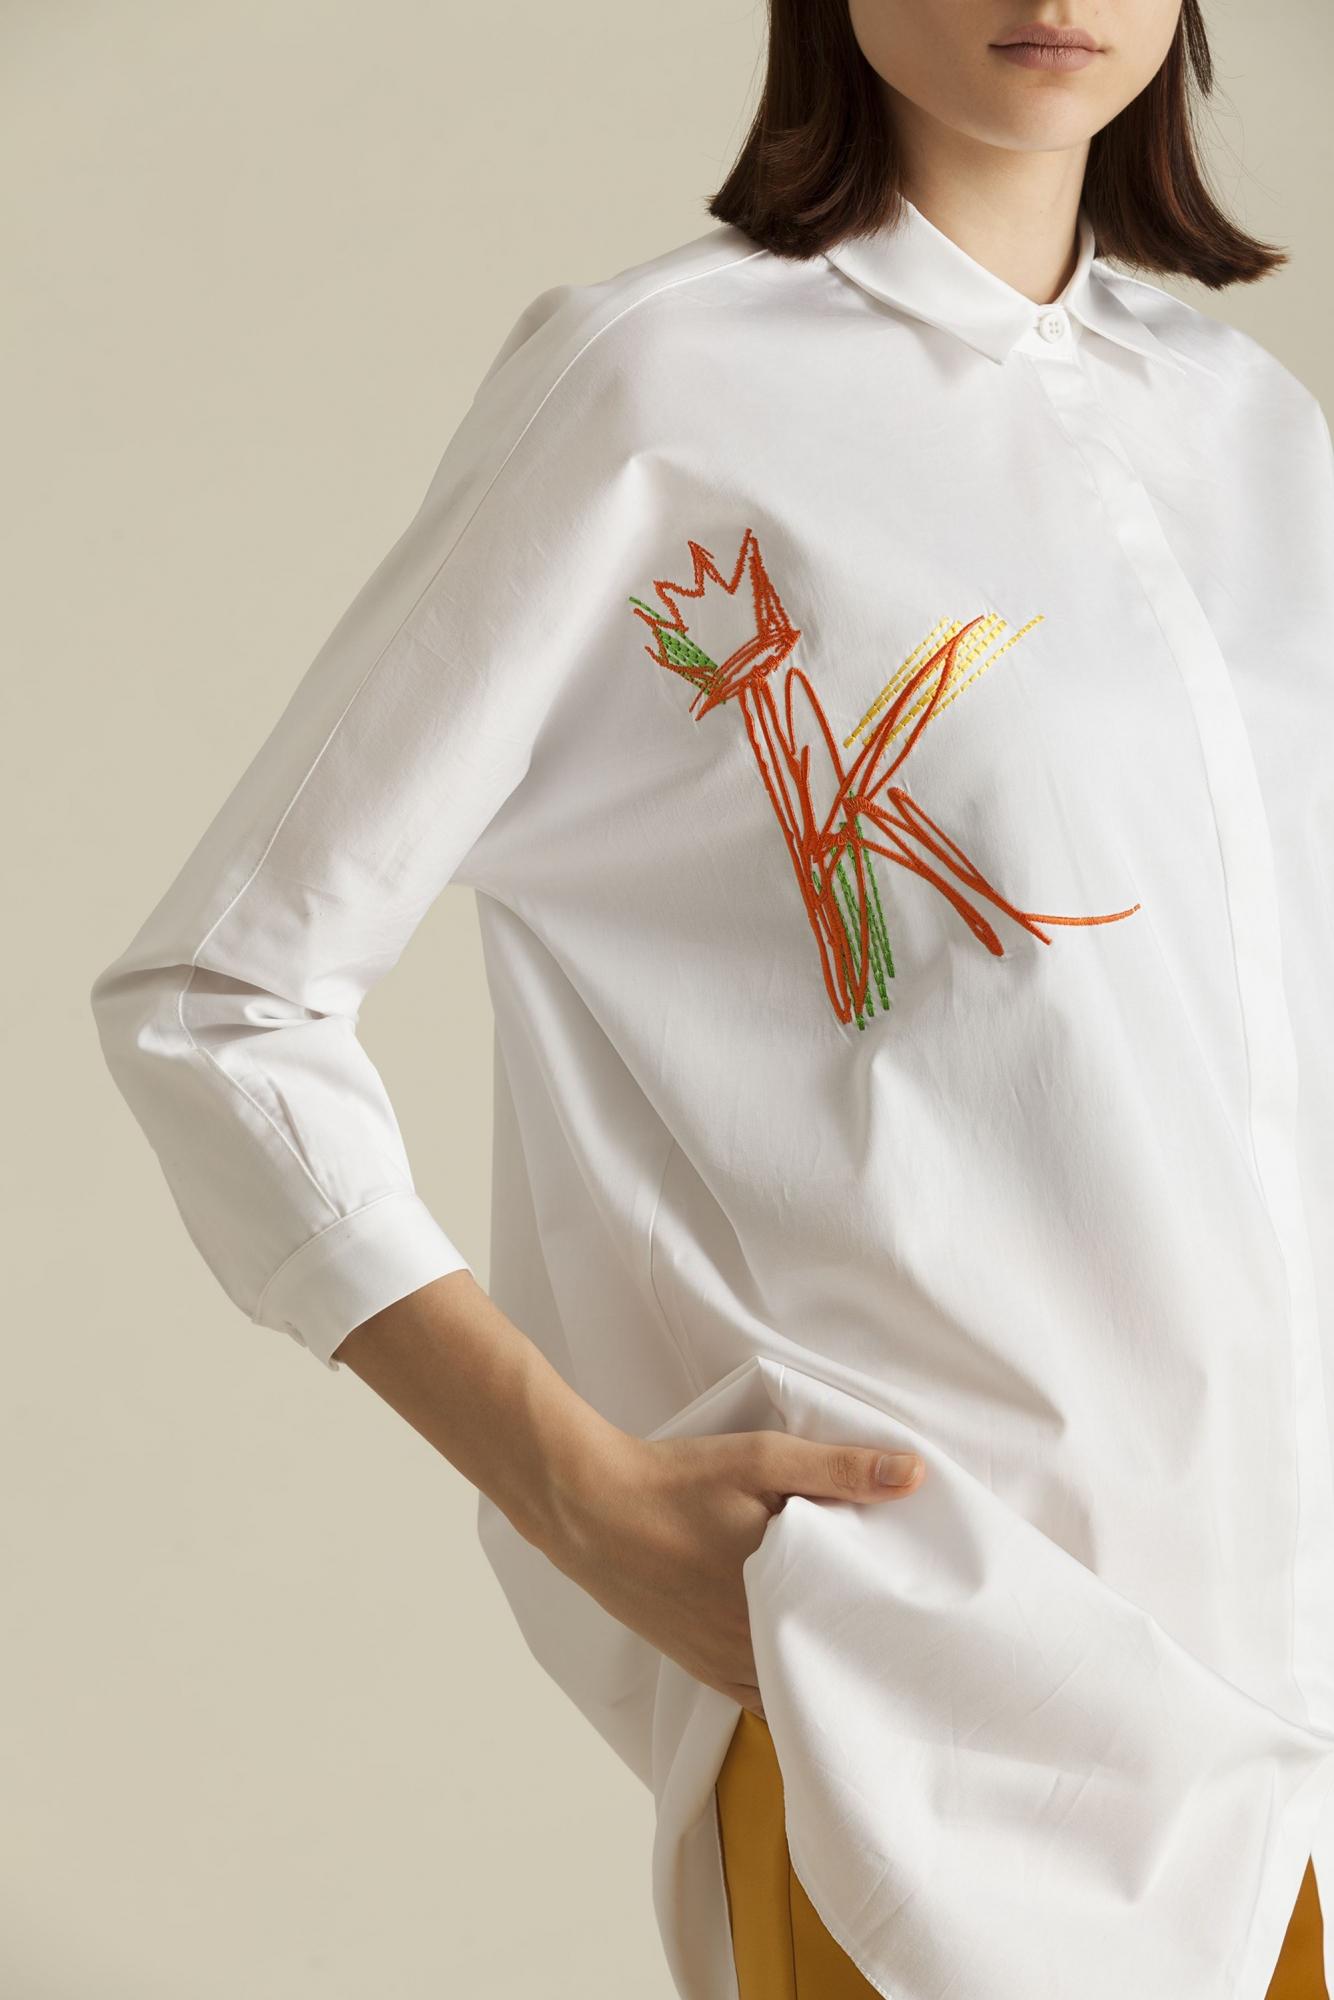 Kuaybe Gider - 1038 Gömlek Beyaz-Nar